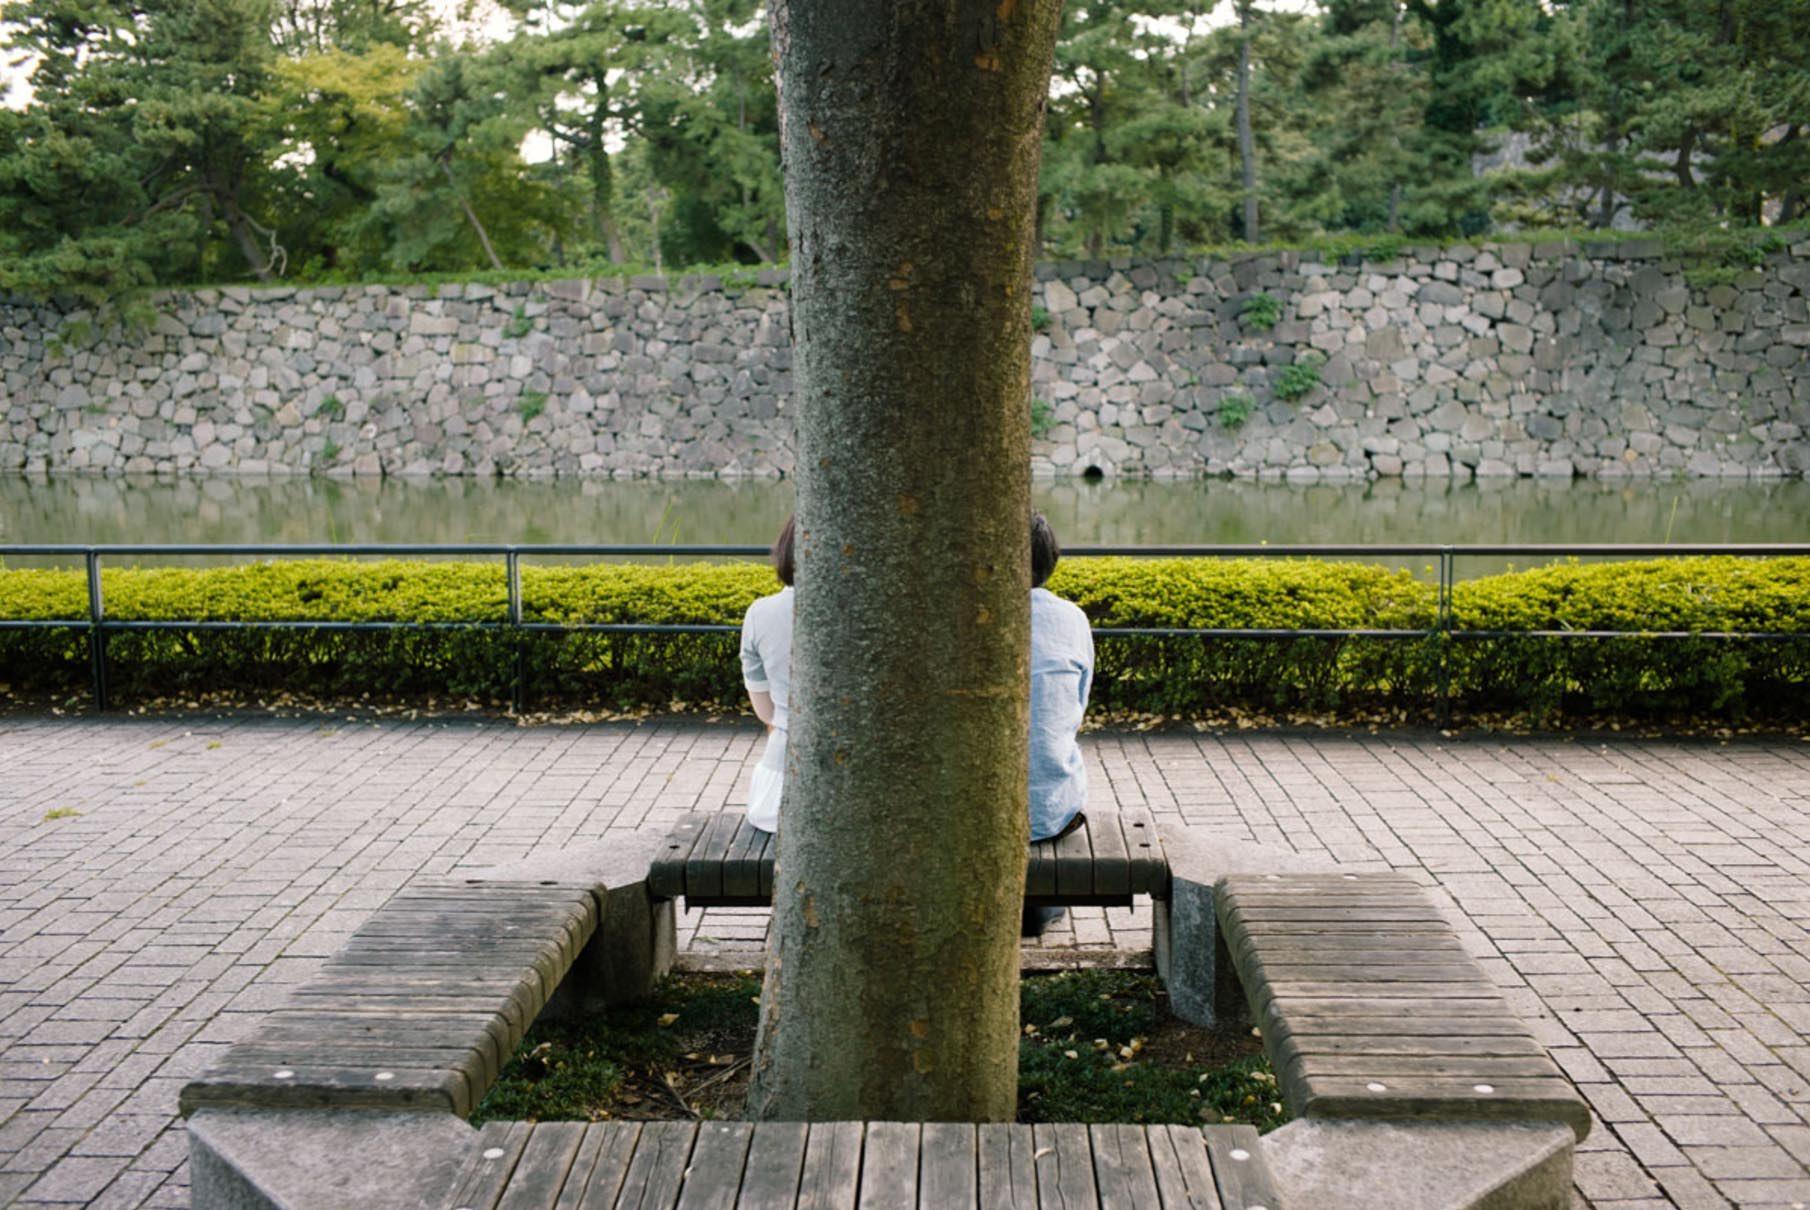 iGNANT_Photography_Natural_Nature_Mankichi_Shinshi_13